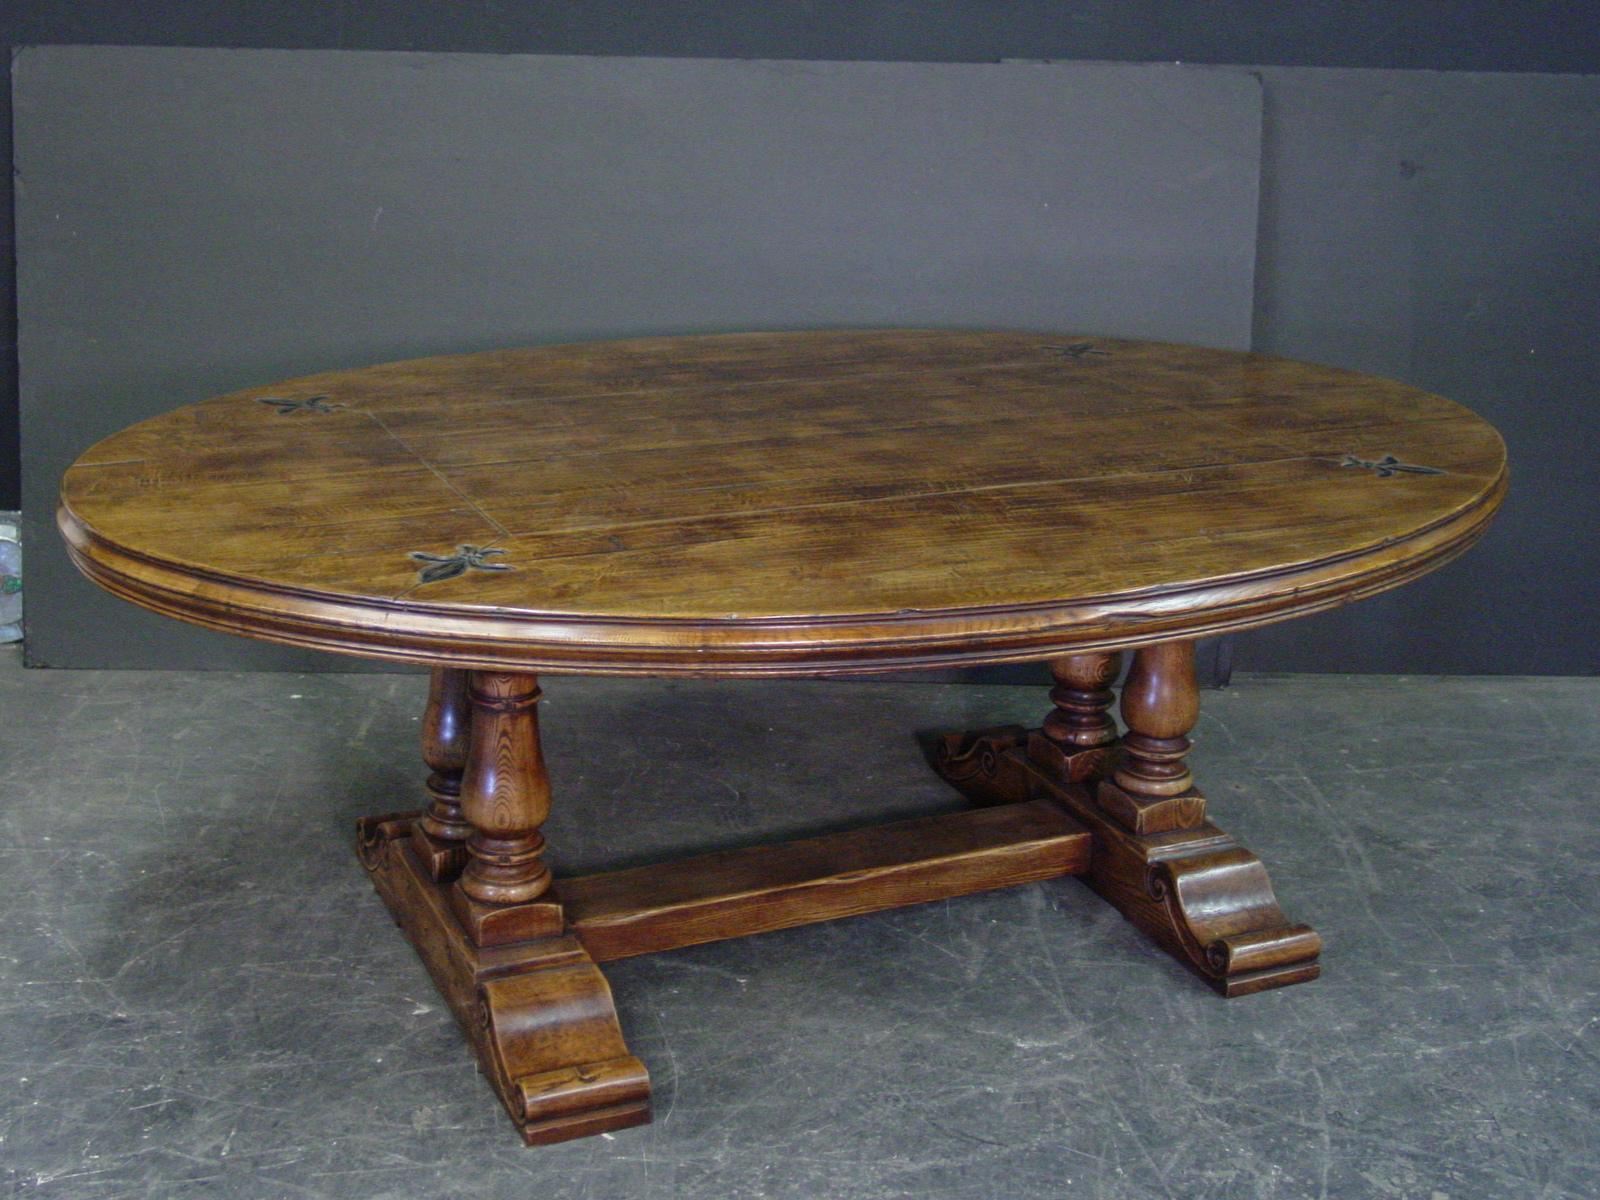 Antique finish oval dining table with fleur de lis details